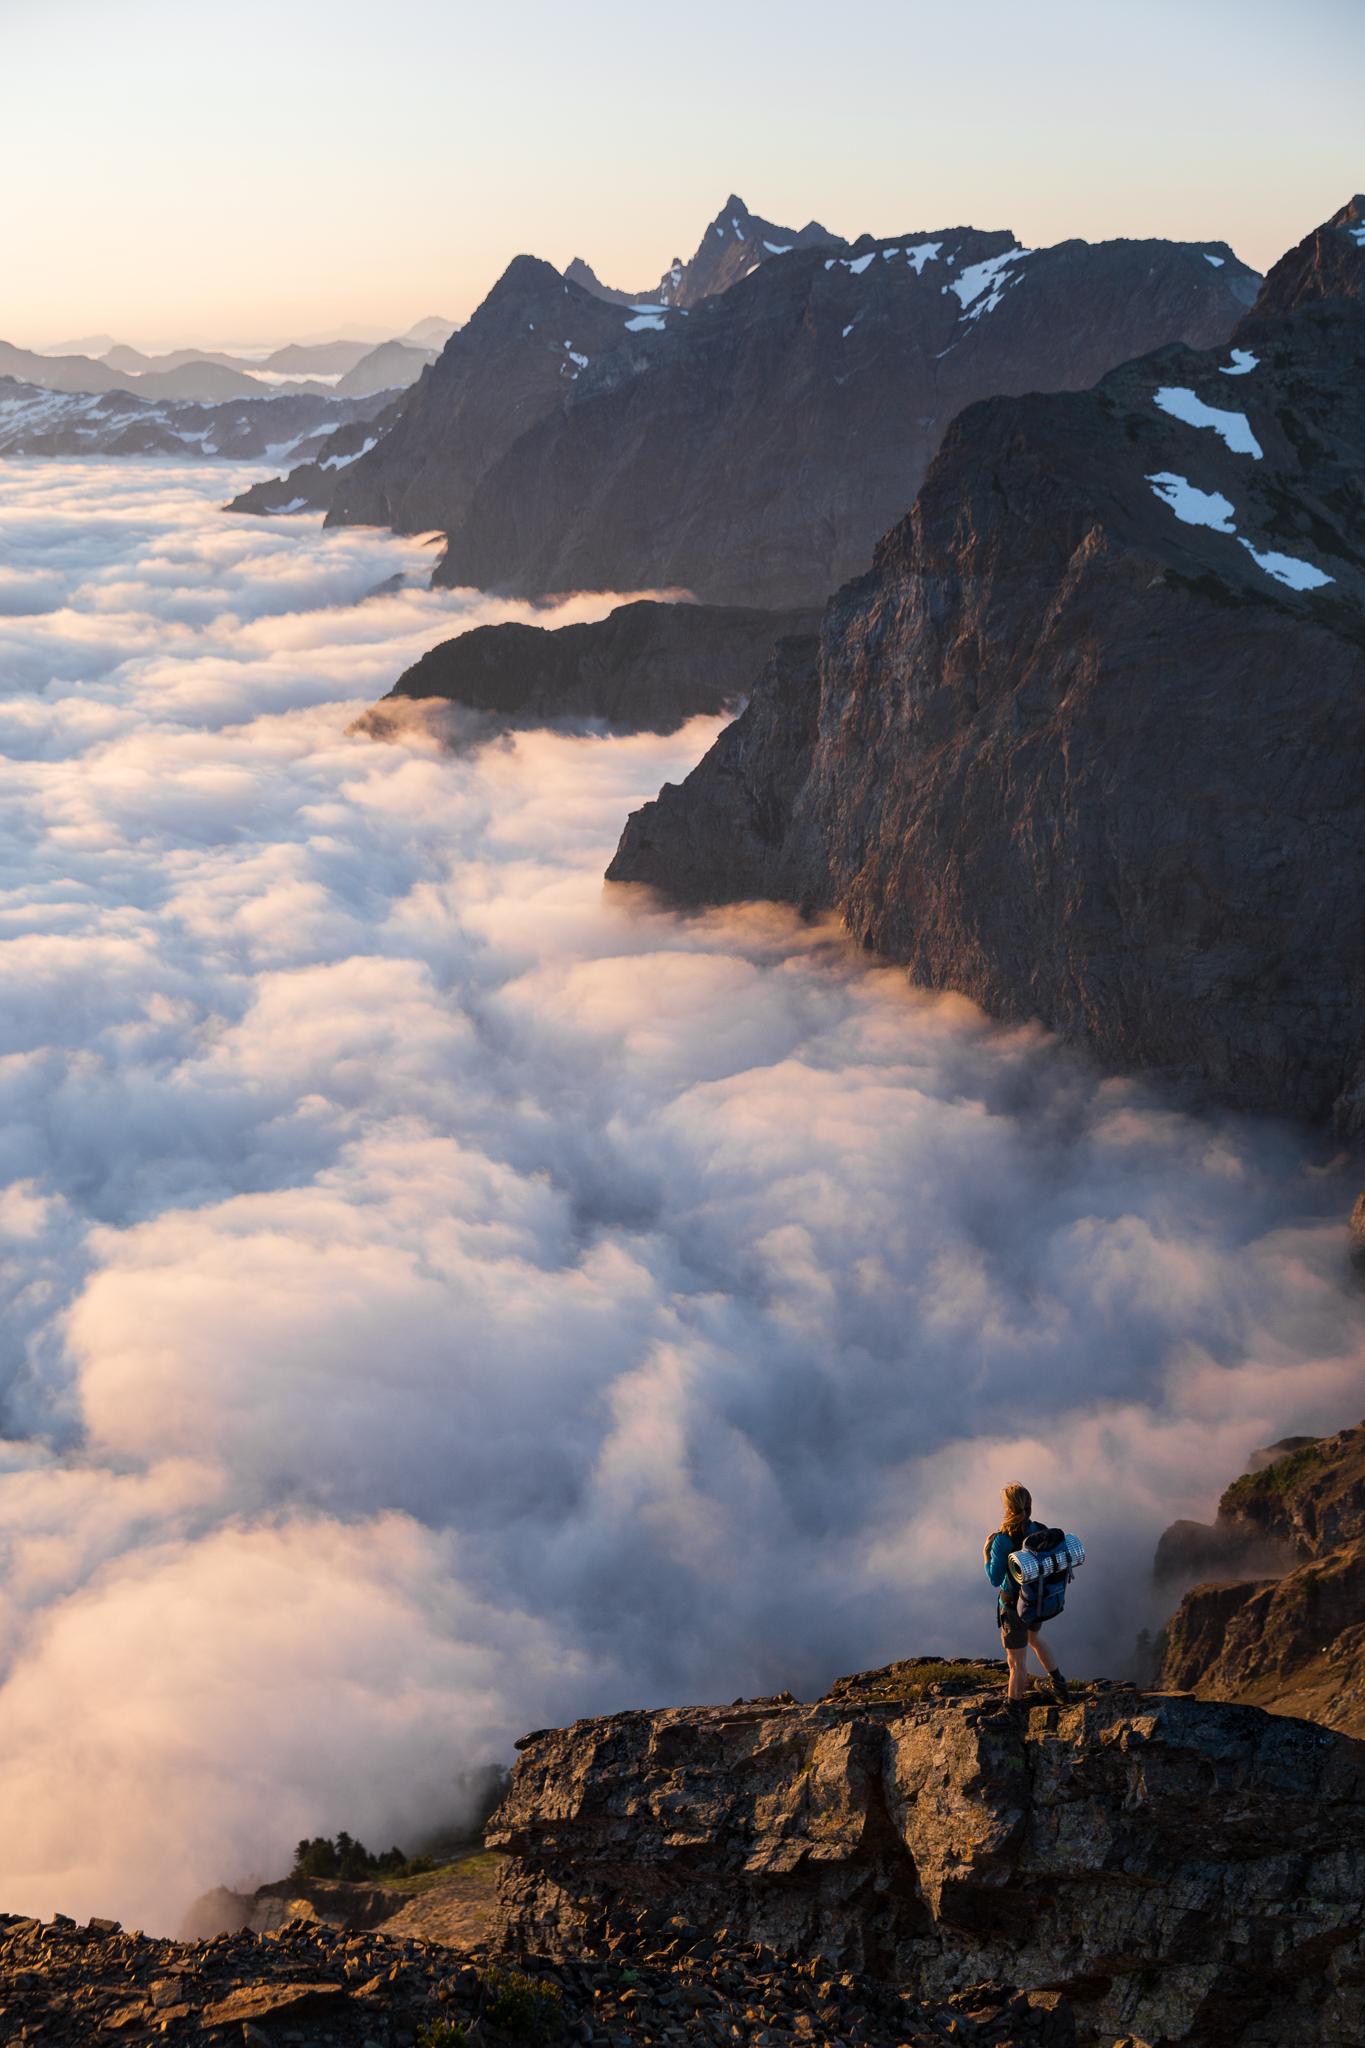 TaylorBurk_MountCheam_Fog+Hiker.jpg